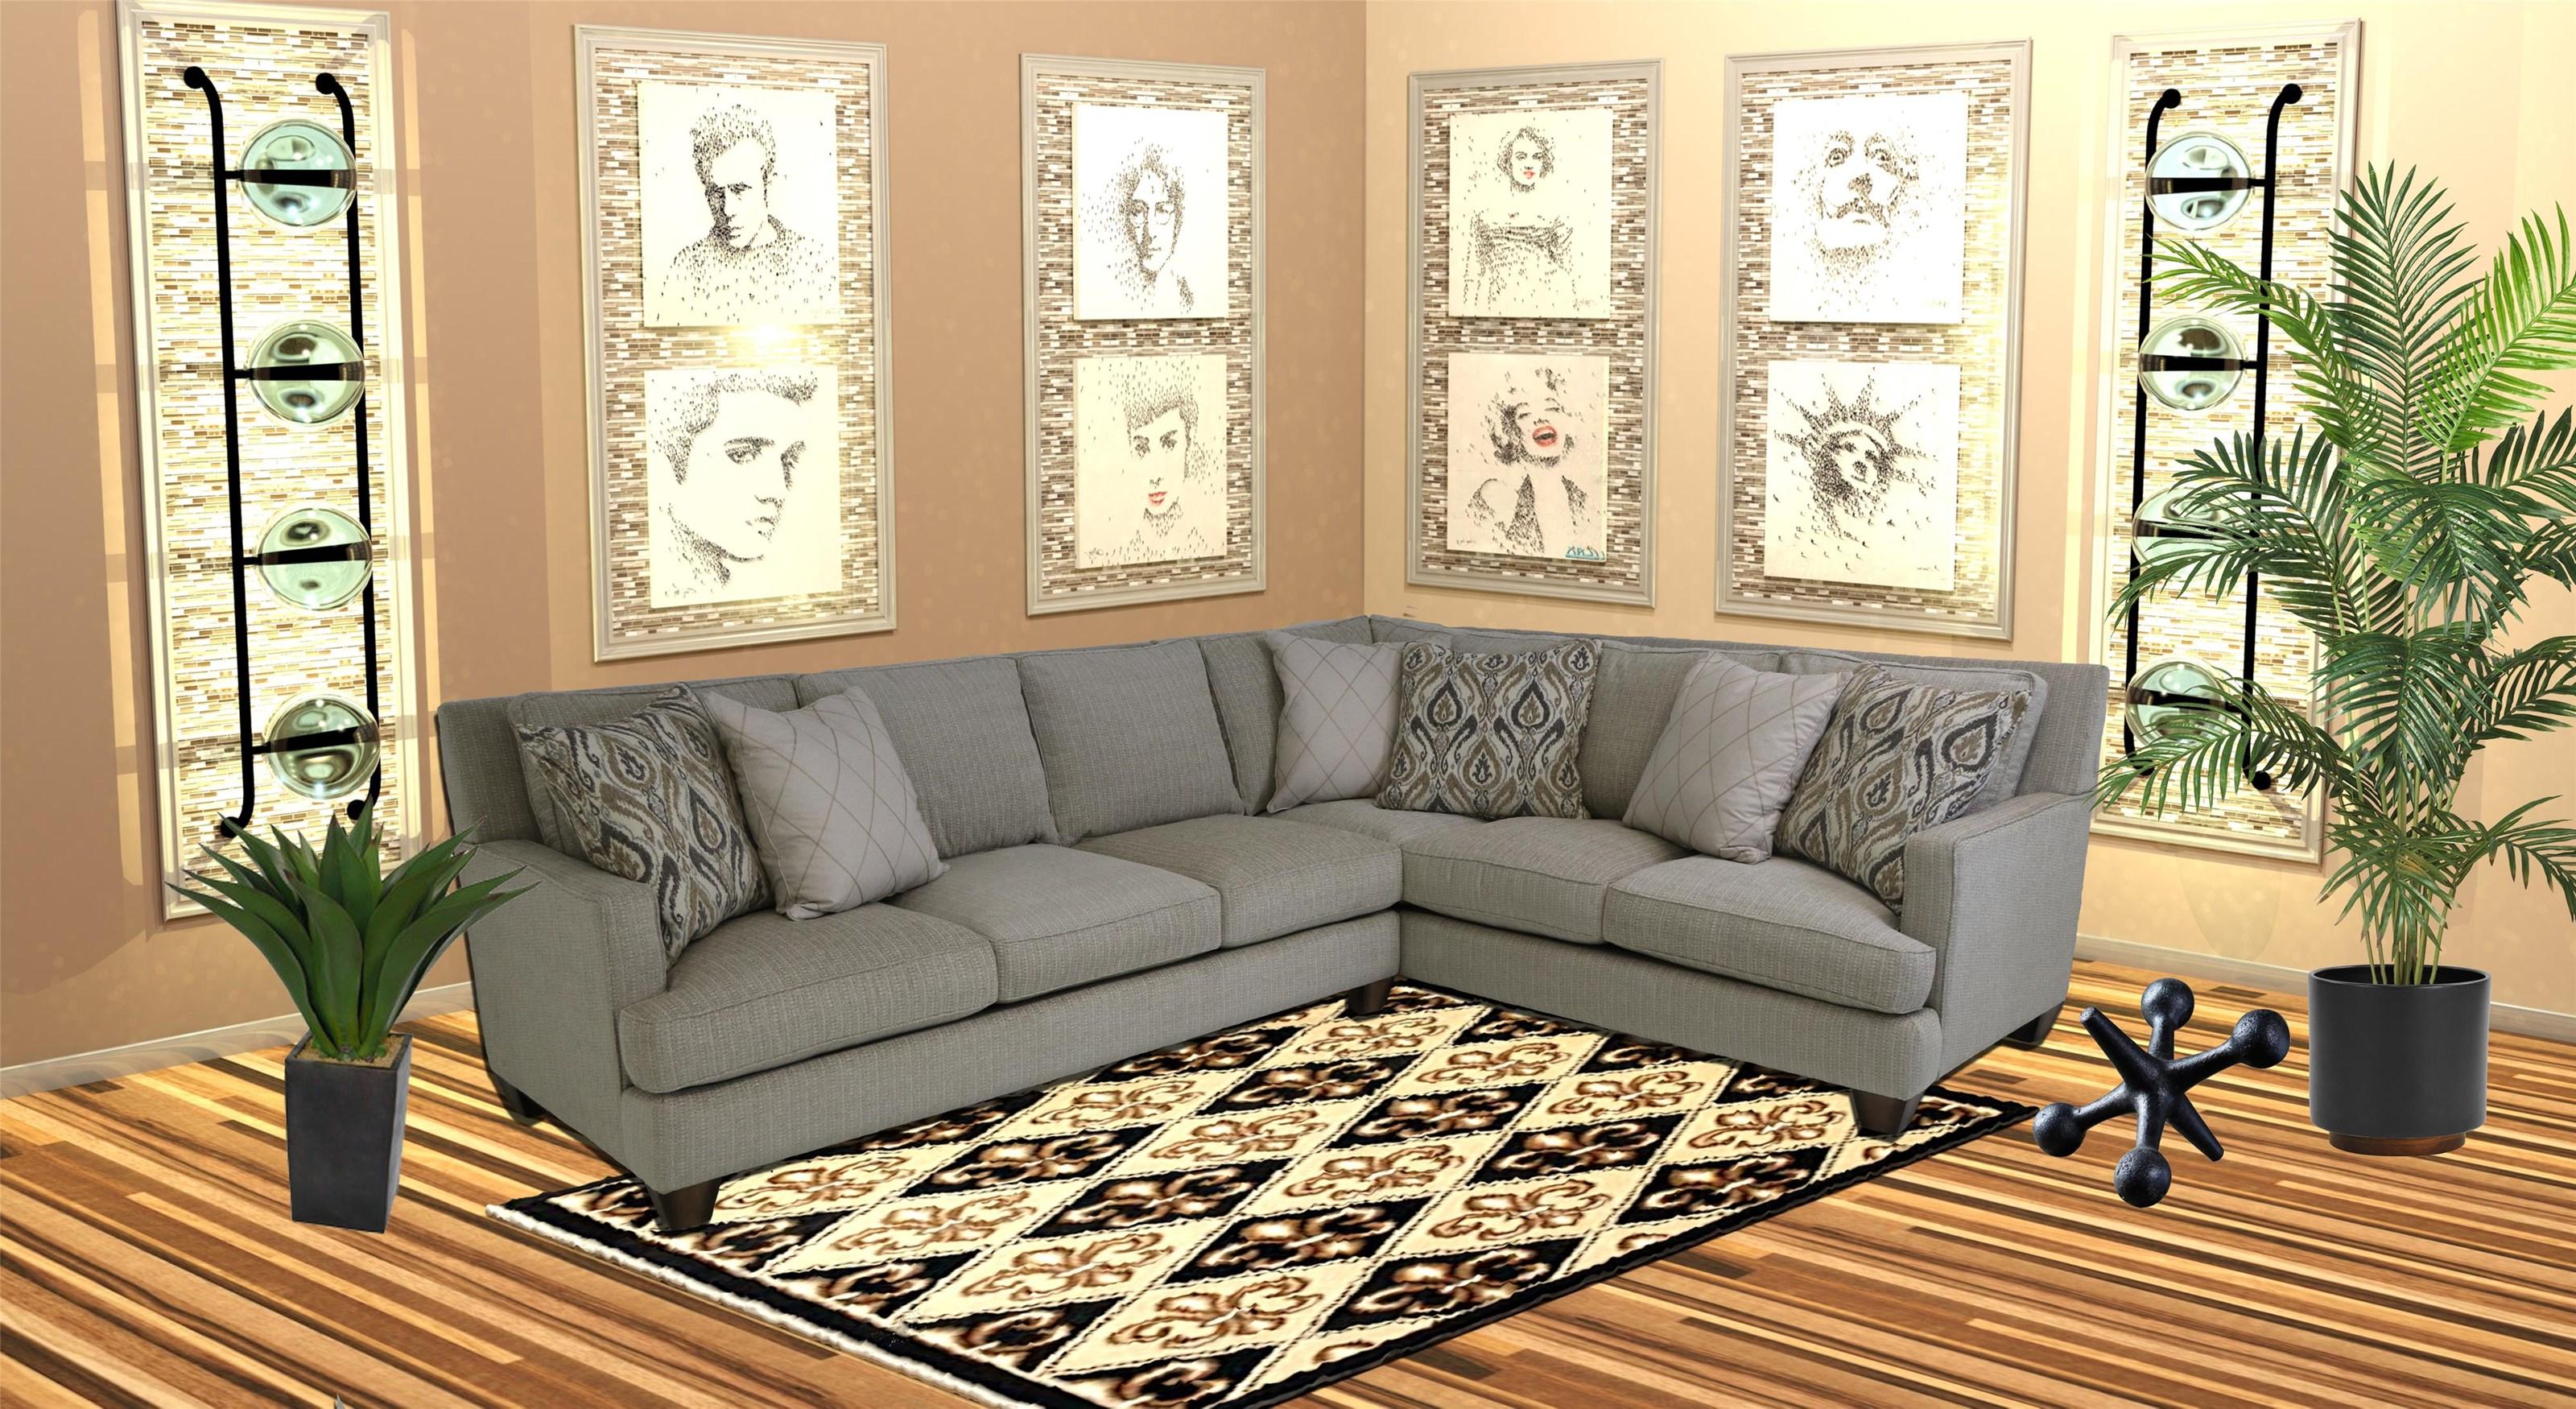 Reeds Trading Company 9500 2 Piece Sectional Sofa - Item Number: 9500-Laf Sofa+Raf Tux